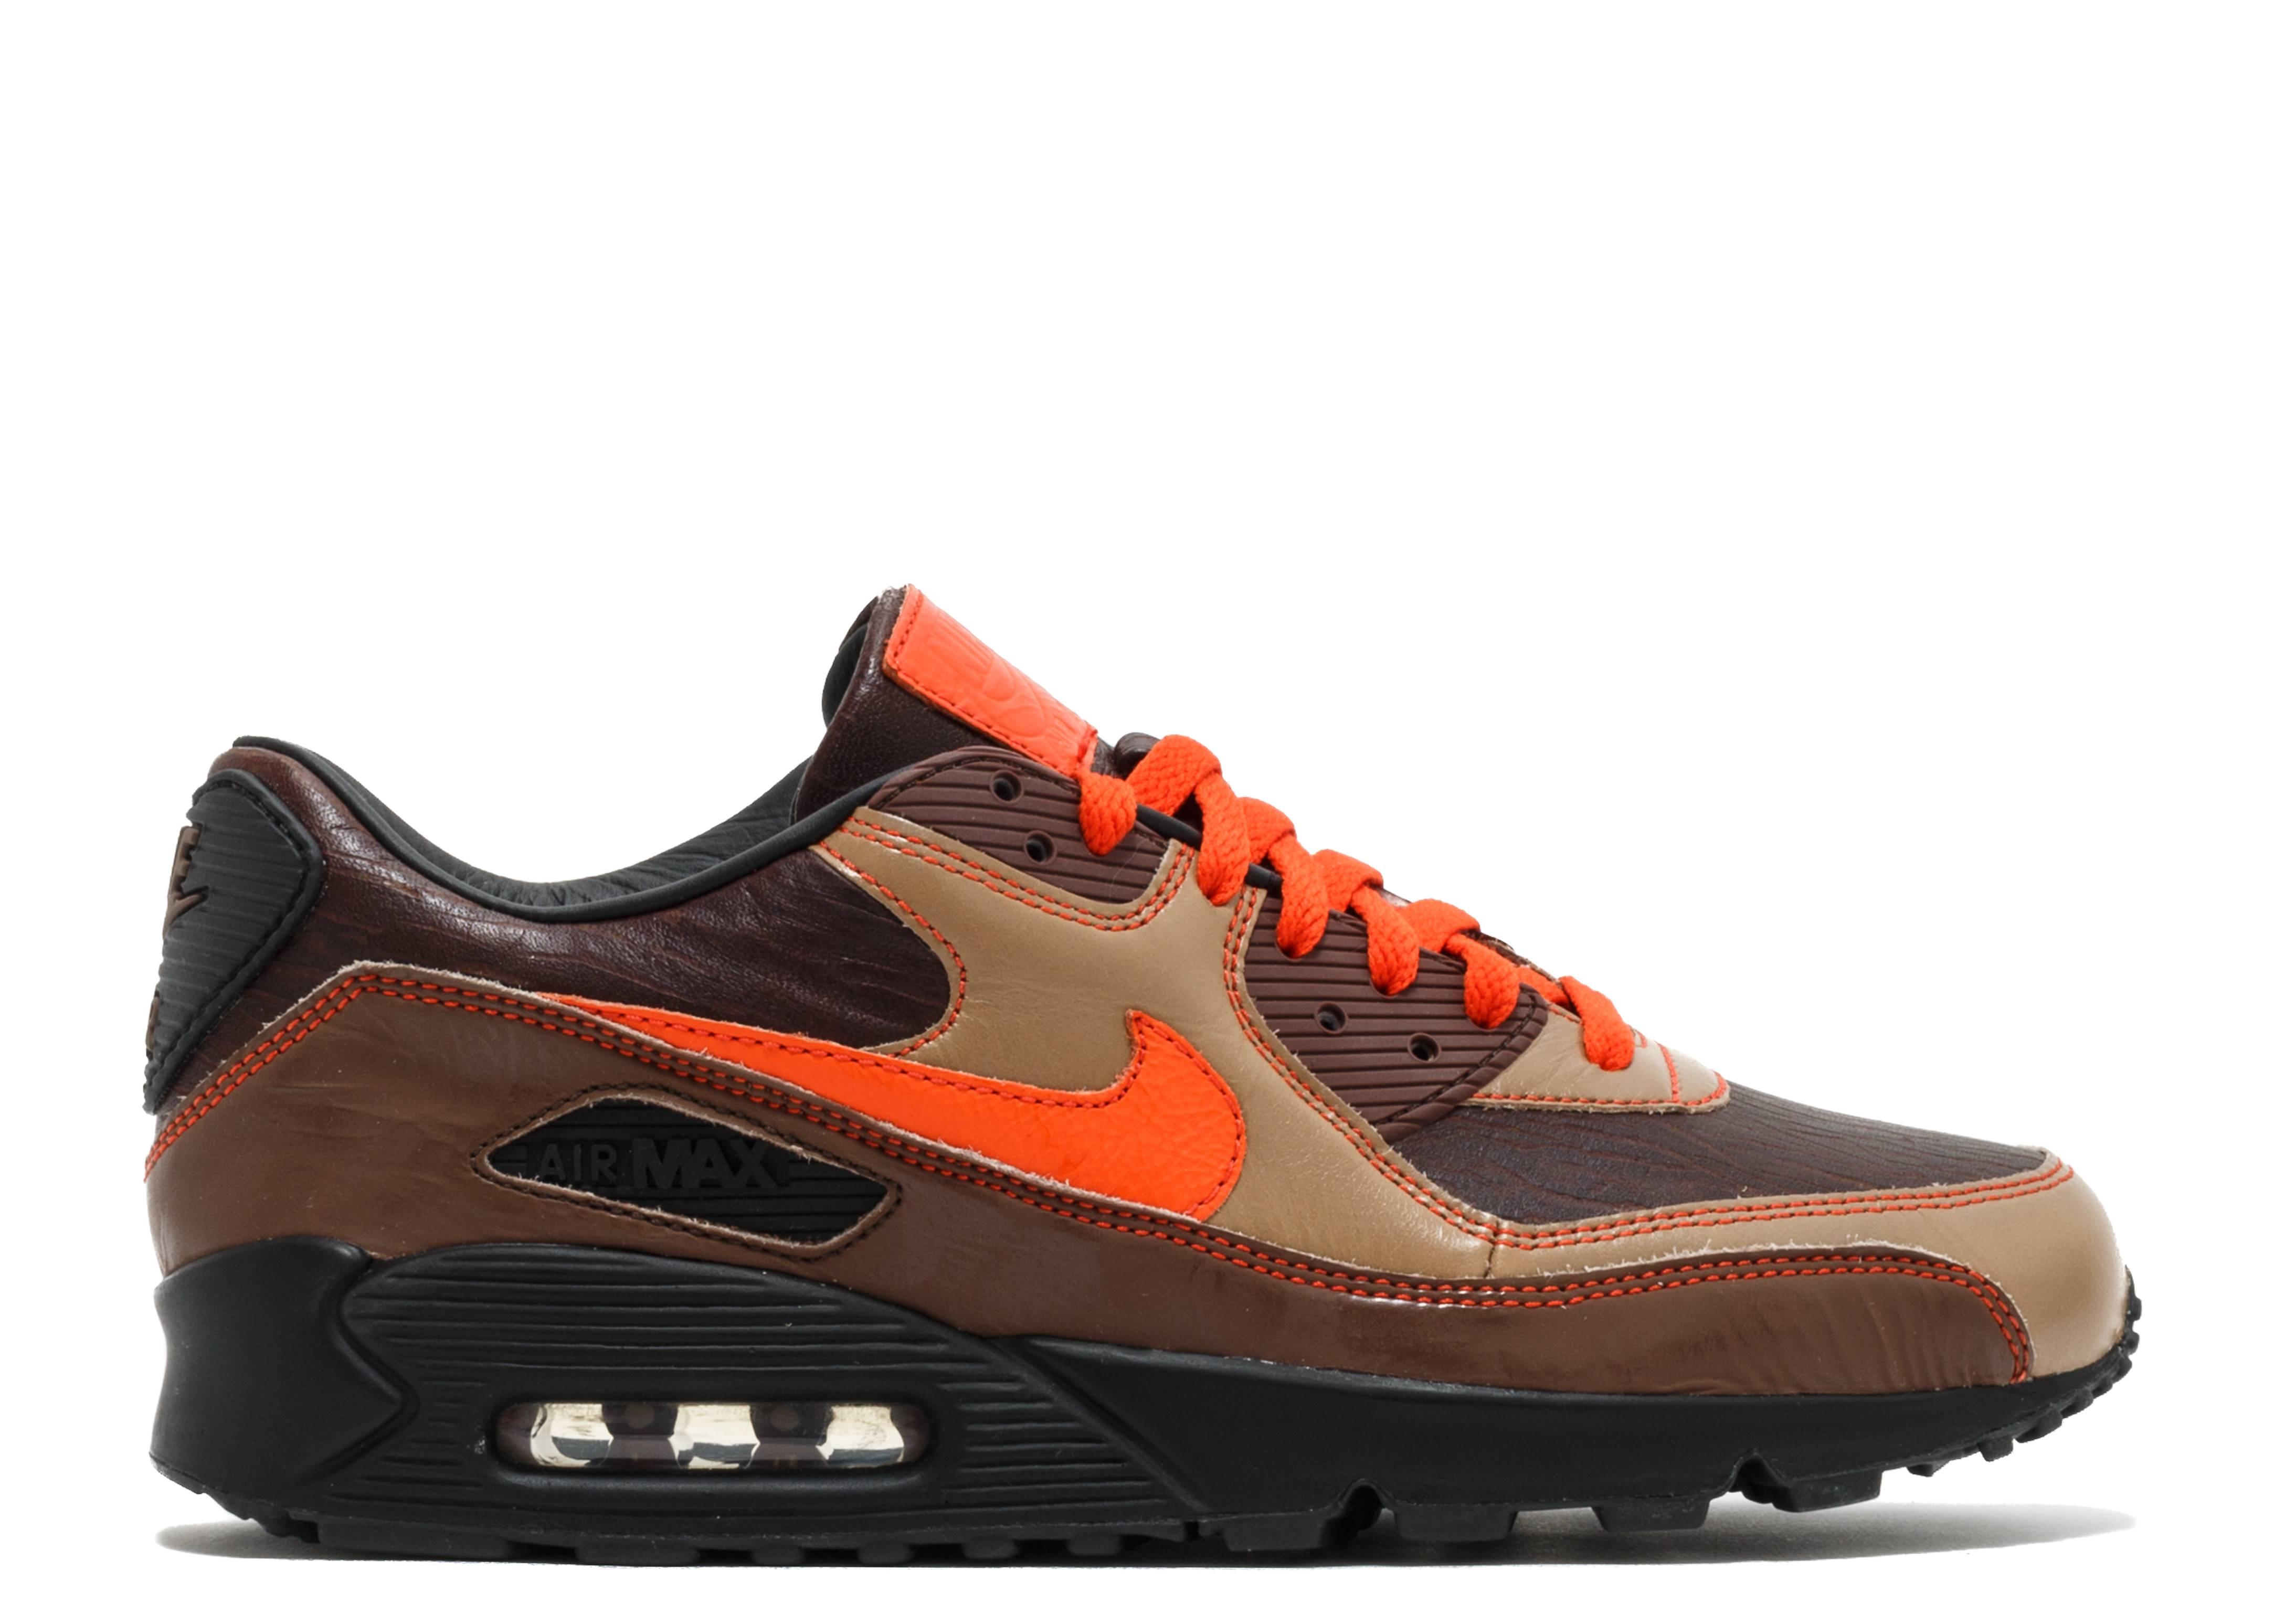 innovative design cc119 f63f7 Air Max 90 I.D - Nike - 318583 991 - brown  orange   Flight Club